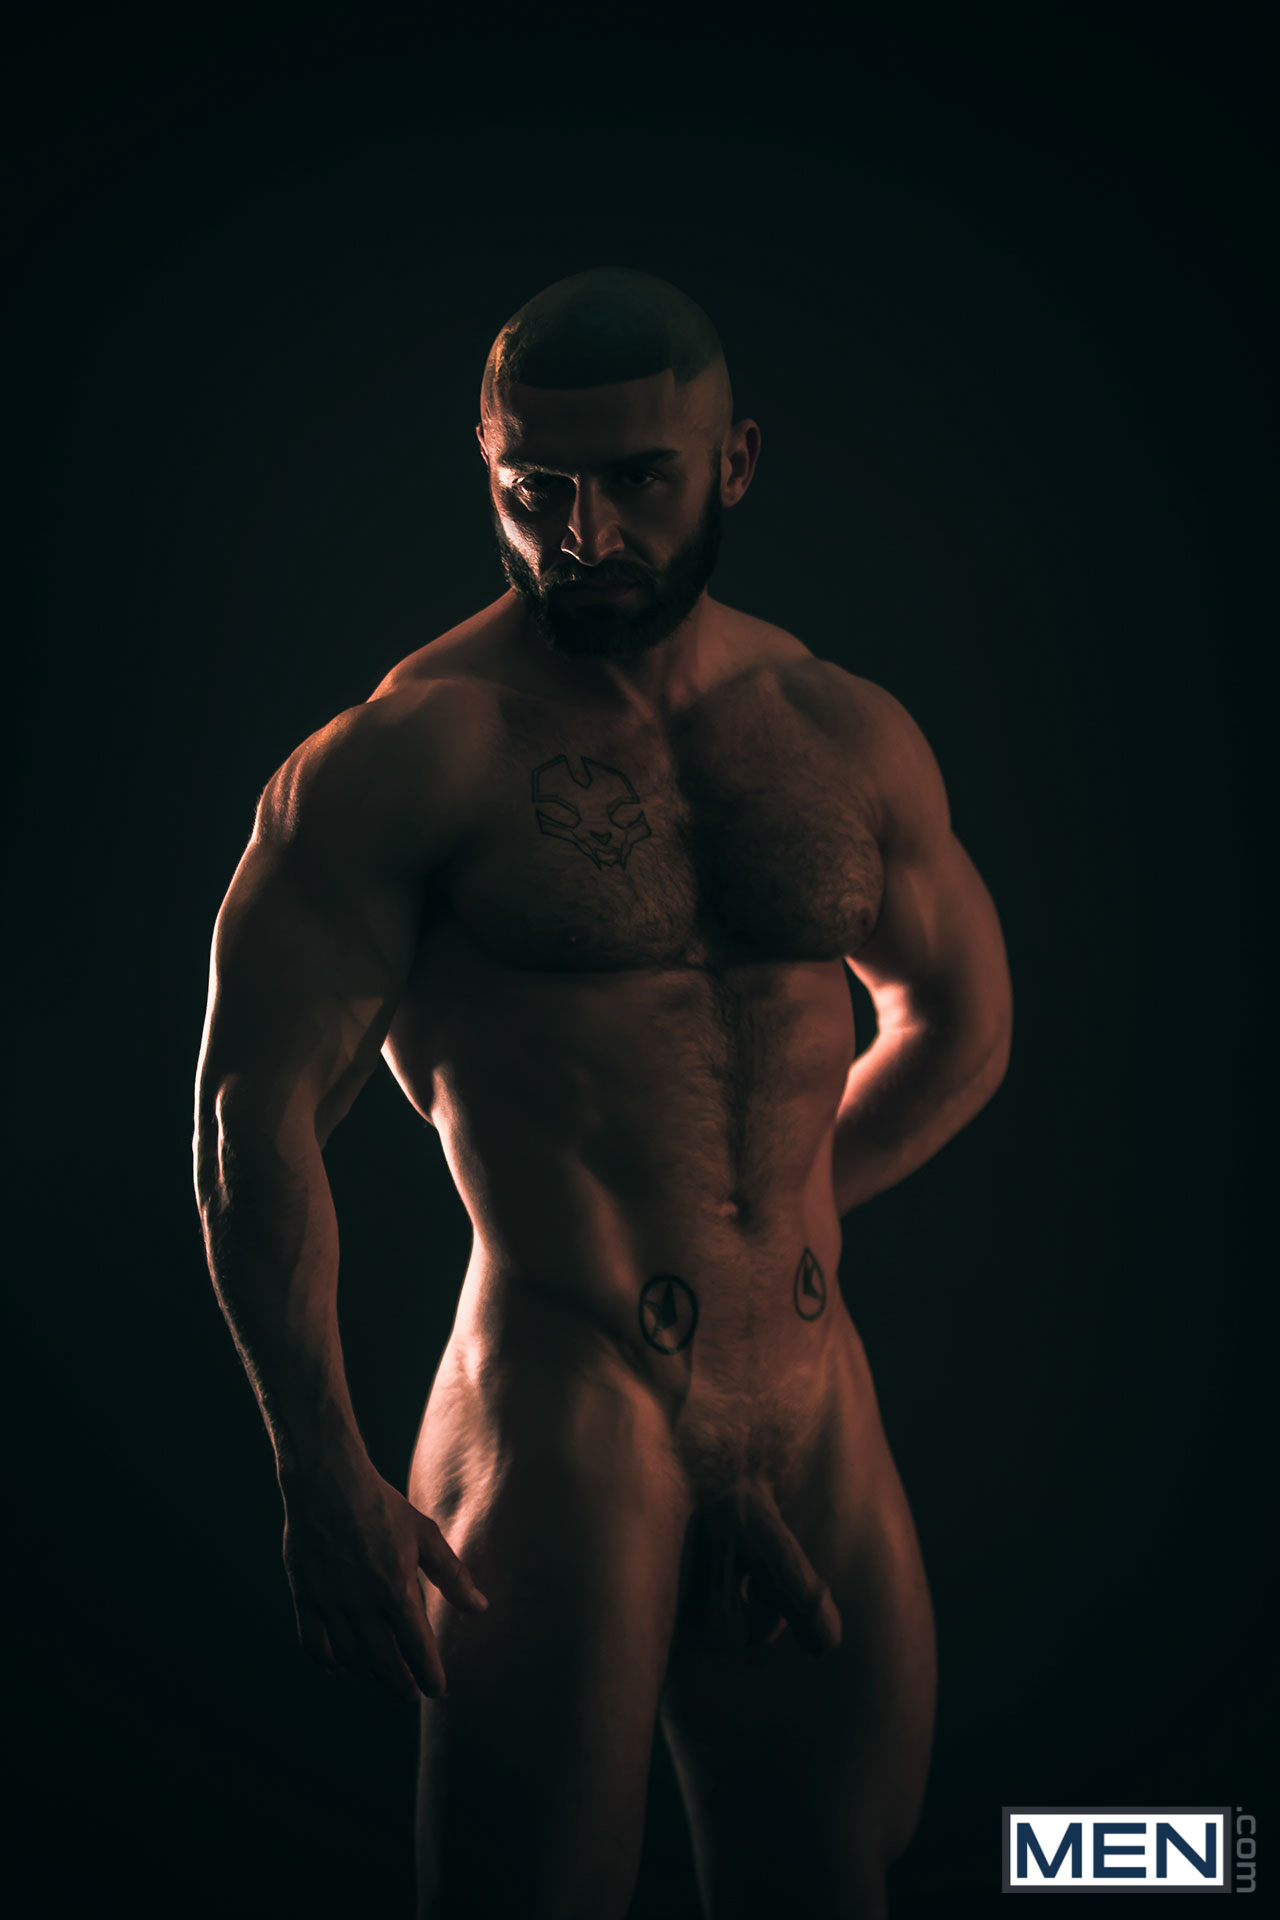 Francois sagat and more muscular men pissing 2